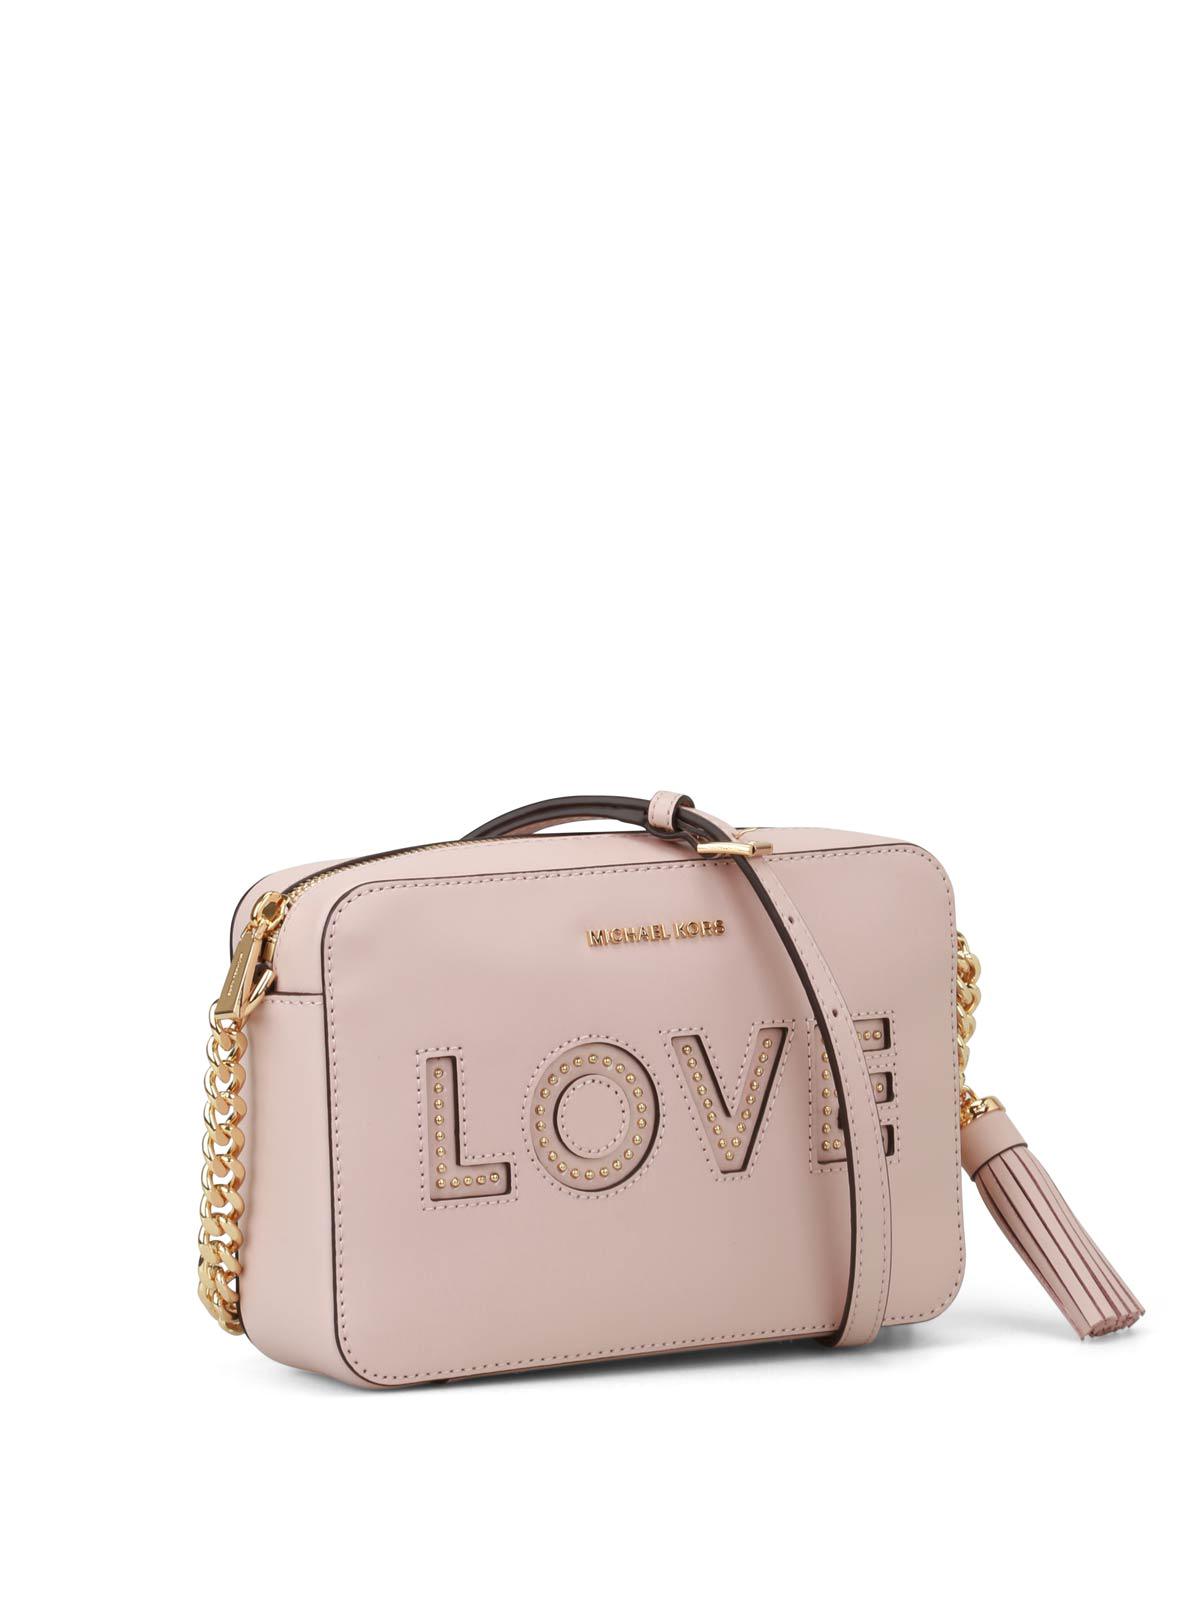 38e8365edf2fe MICHAEL KORS  cross body bags online - Ginny Love pink camera bag